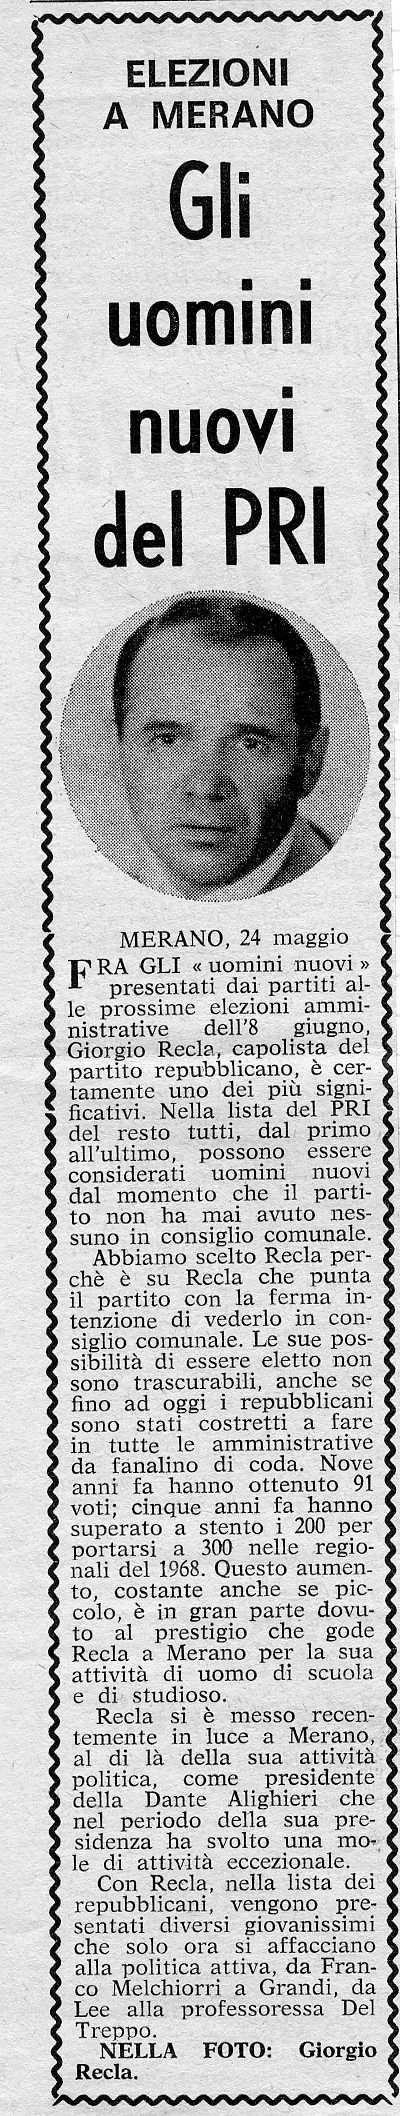 Giorgio Recla001.jpg